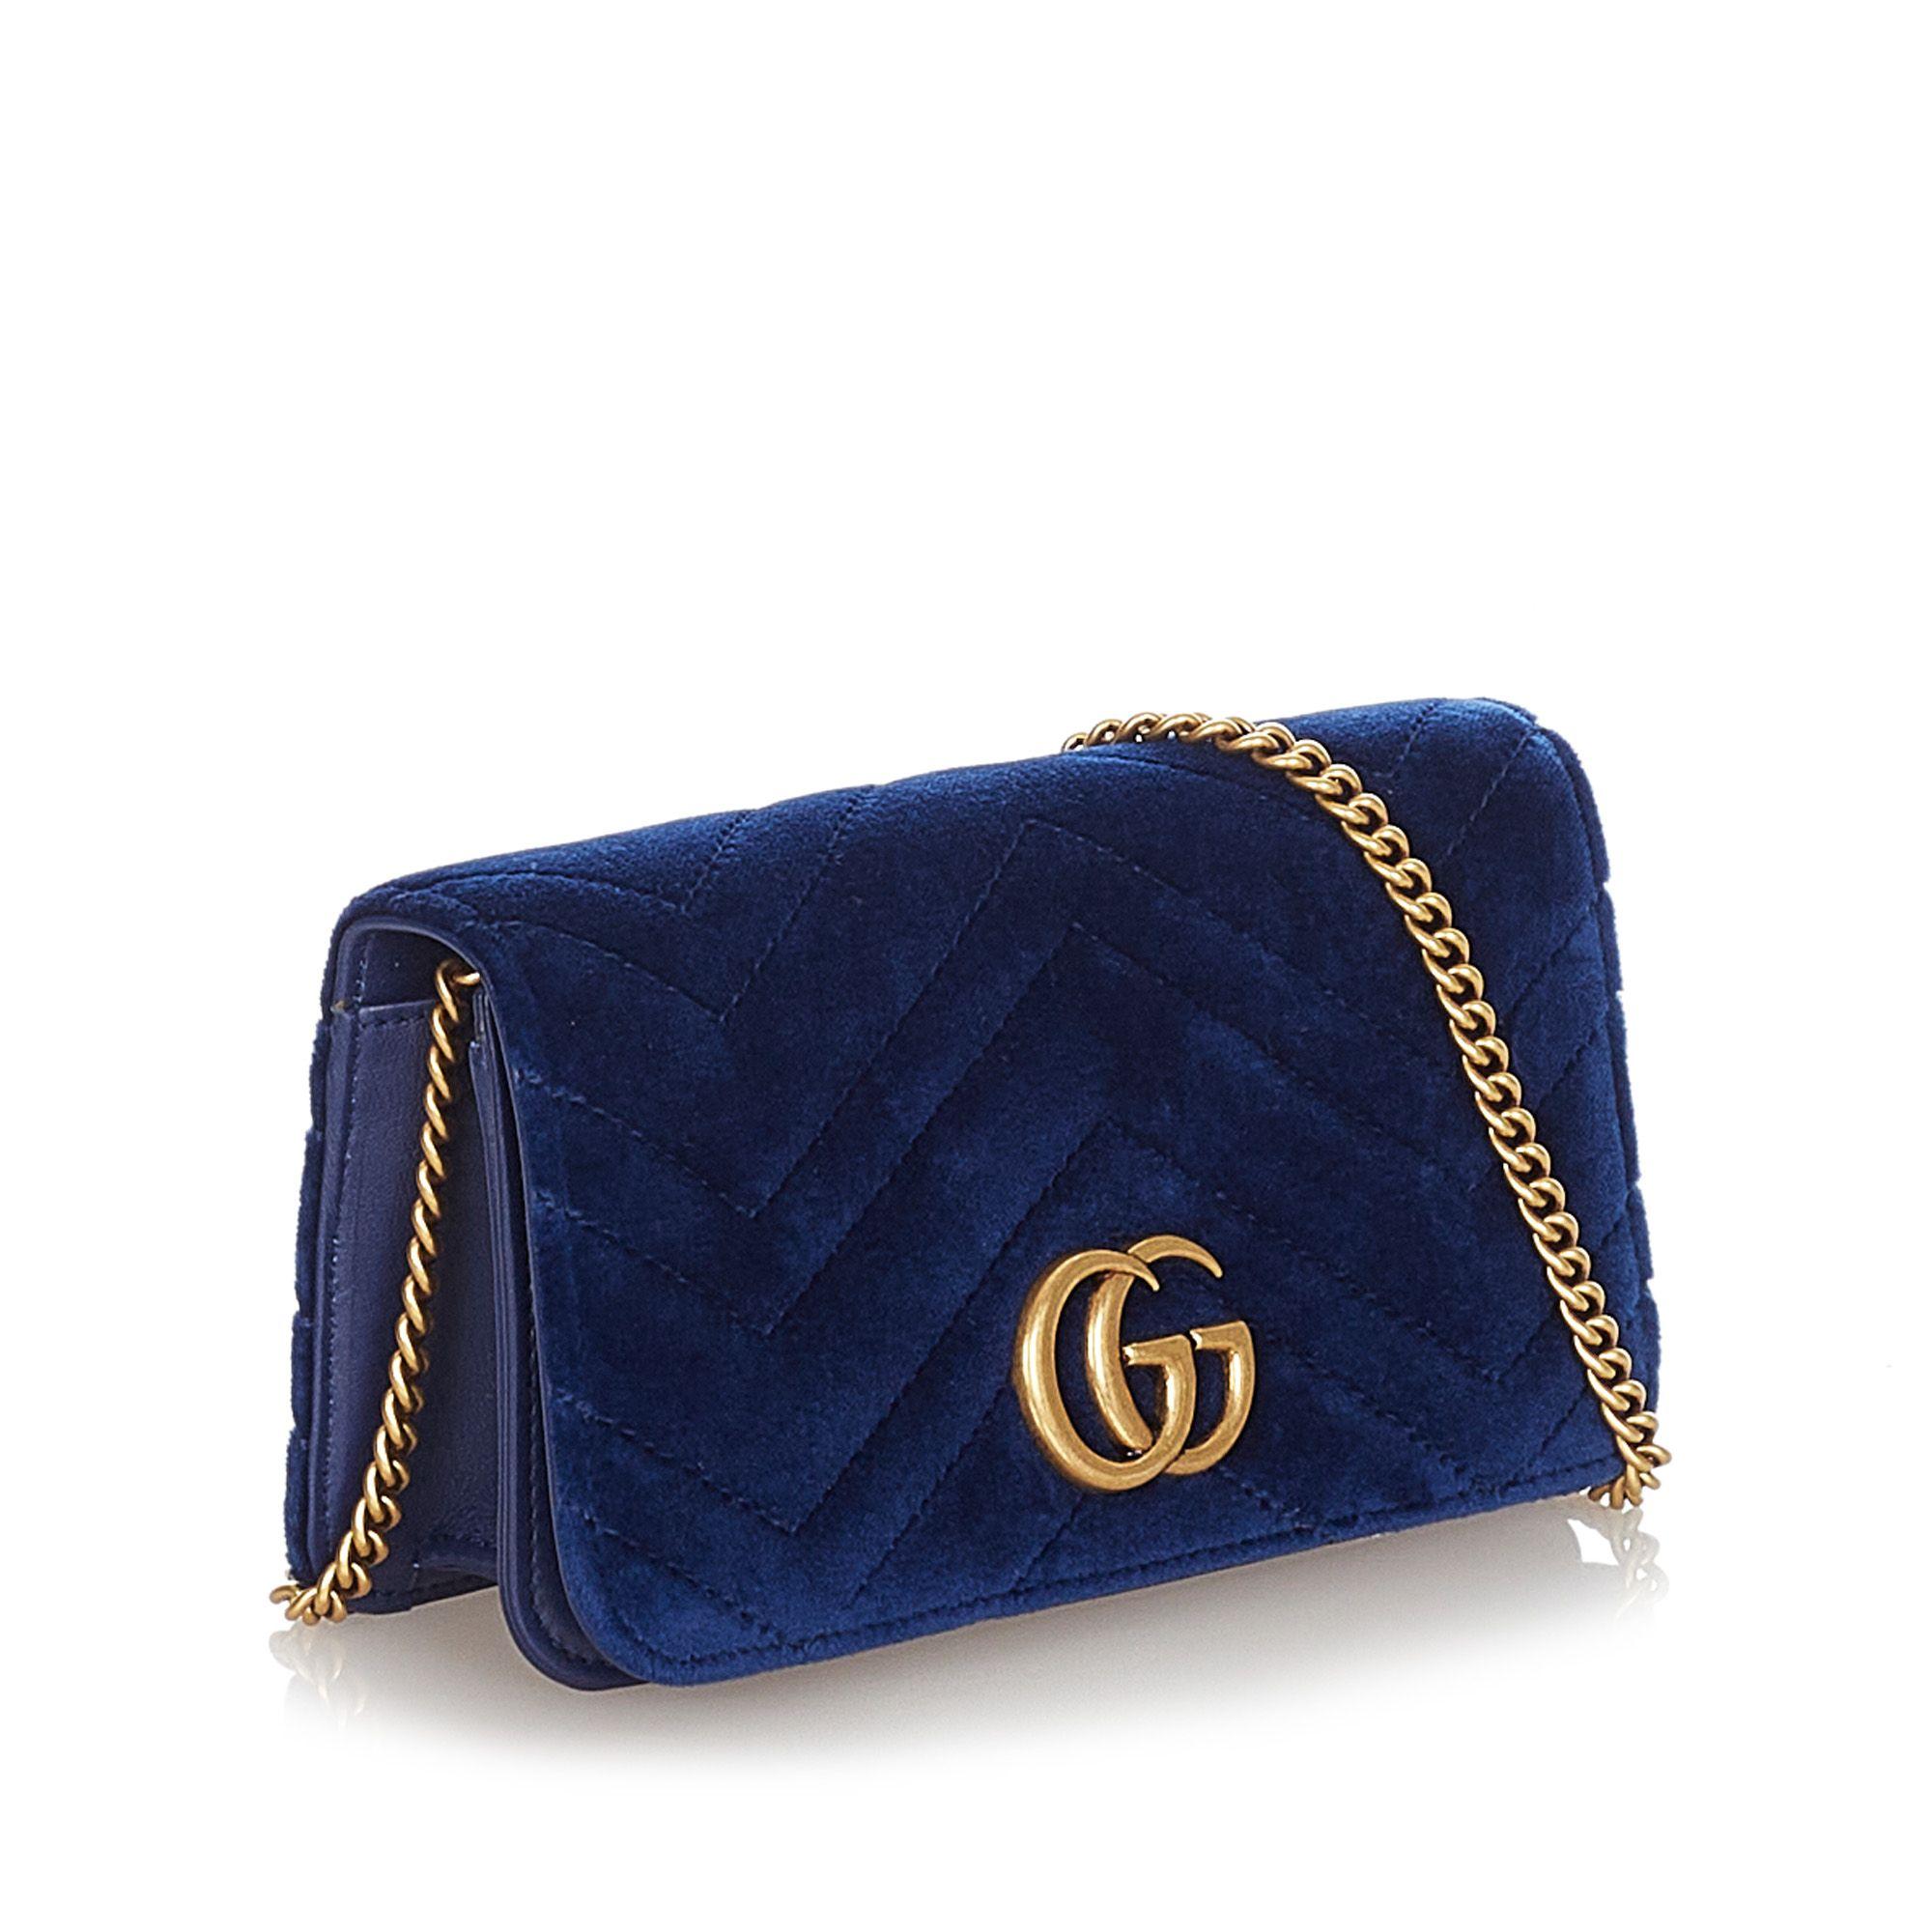 Vintage Gucci Super Mini GG Marmont Velvet Crossbody Bag Blue